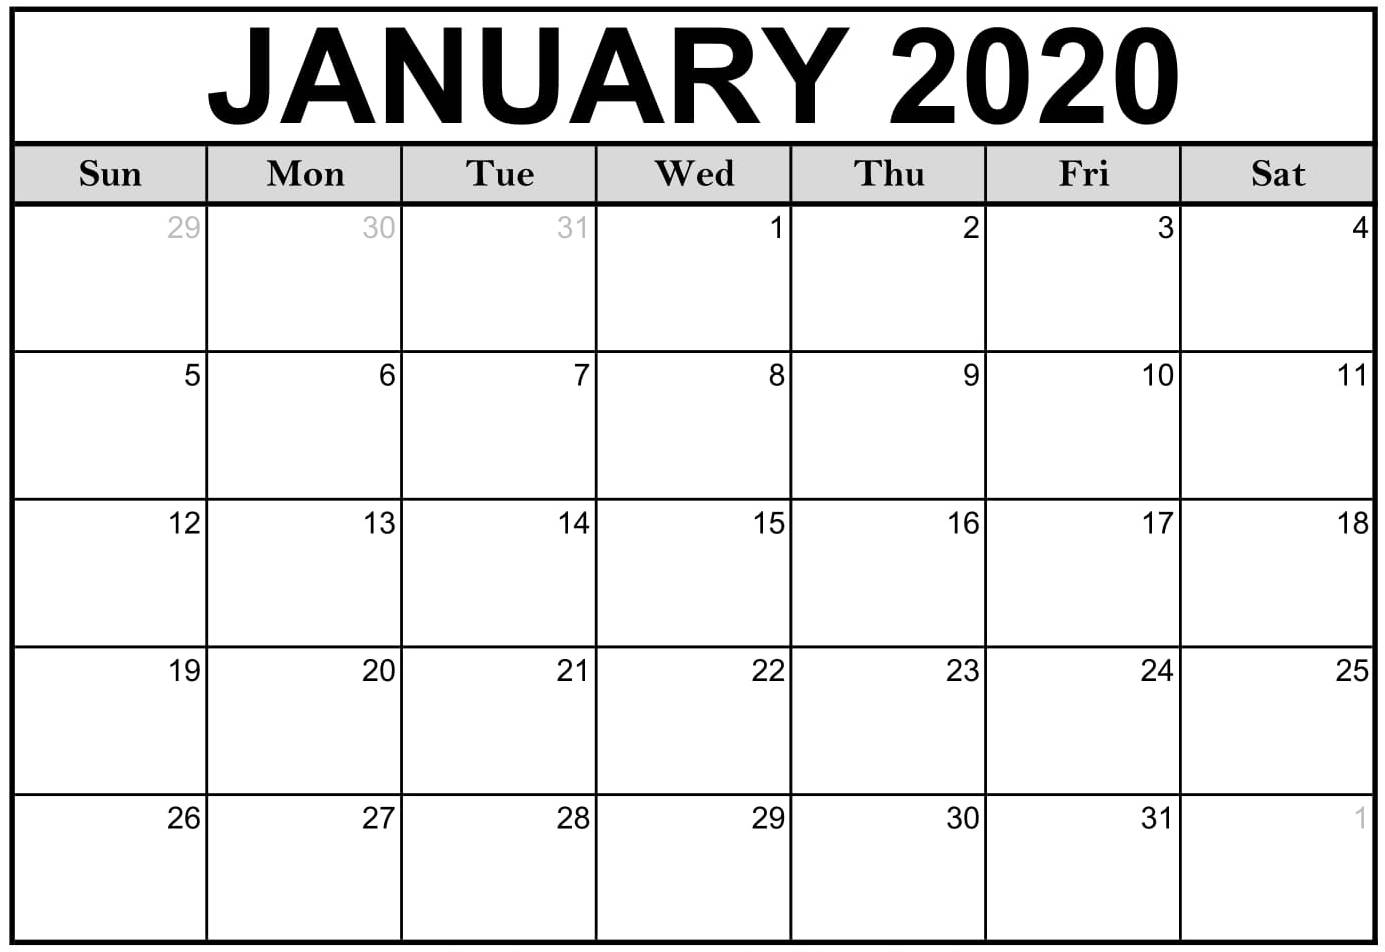 Free Printable January 2020 Calendar Editable Datesheets pertaining to January 2020 Calendar